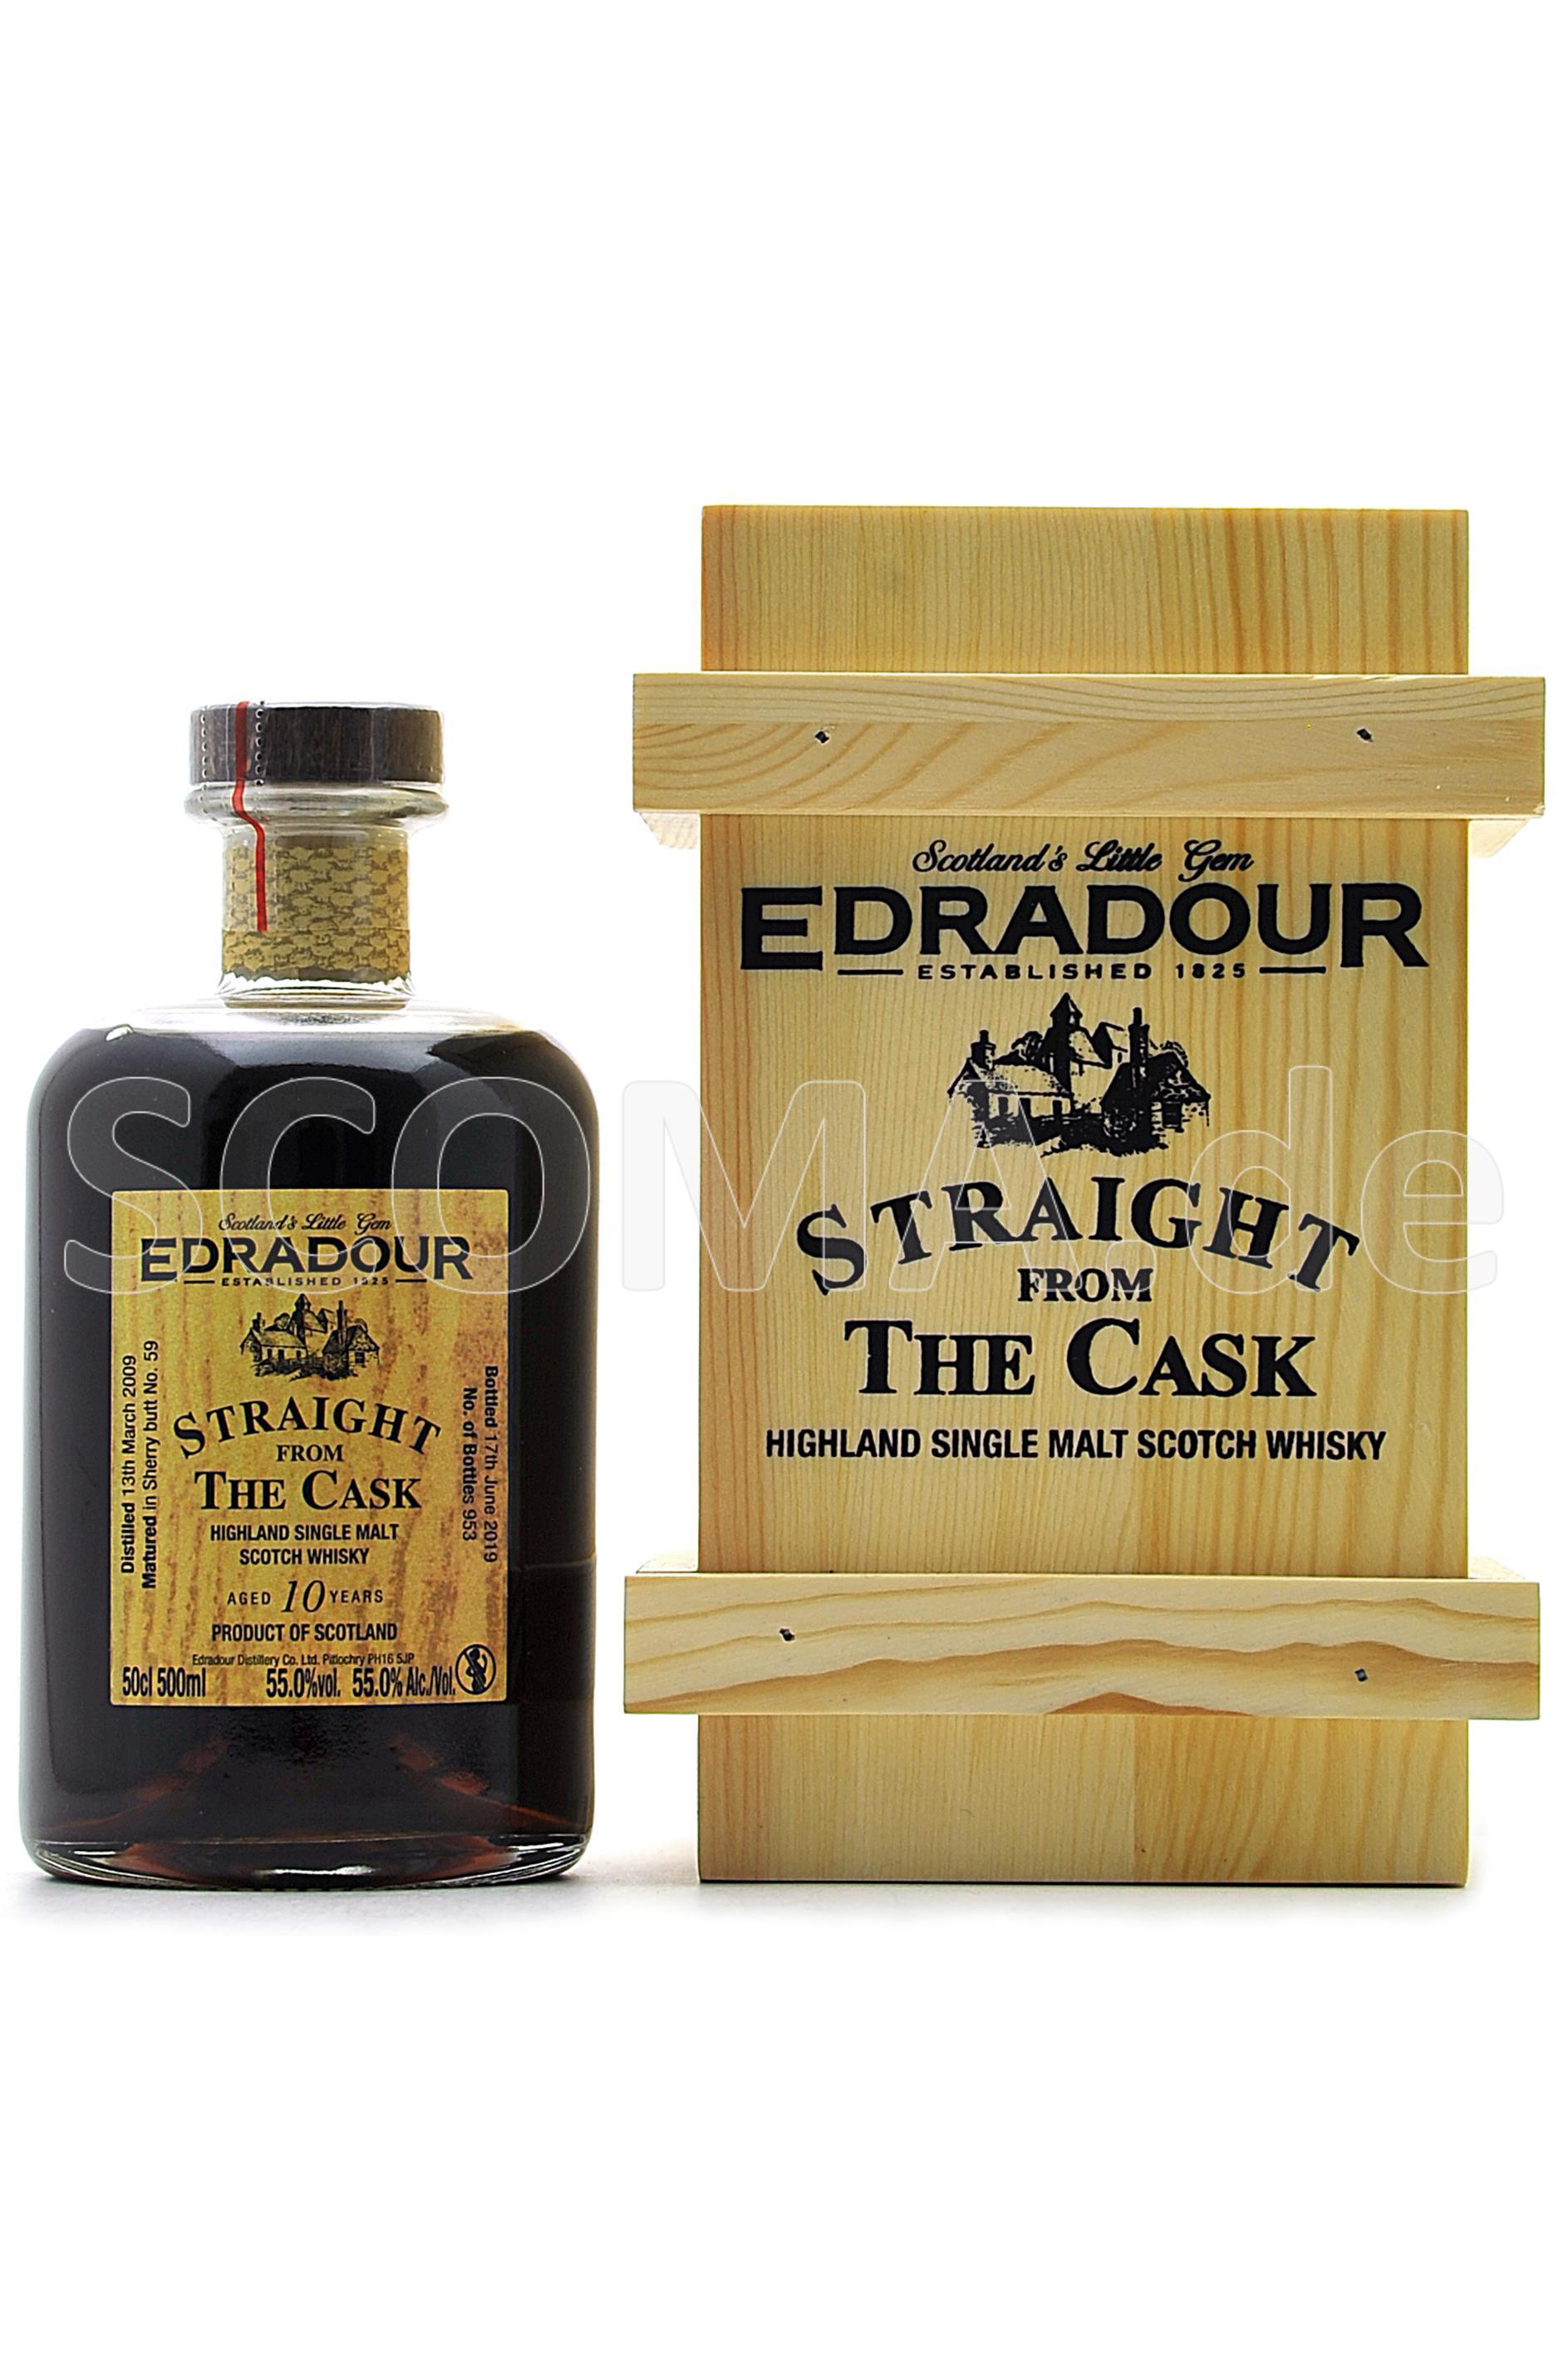 Edradour 2009/2019 10 years